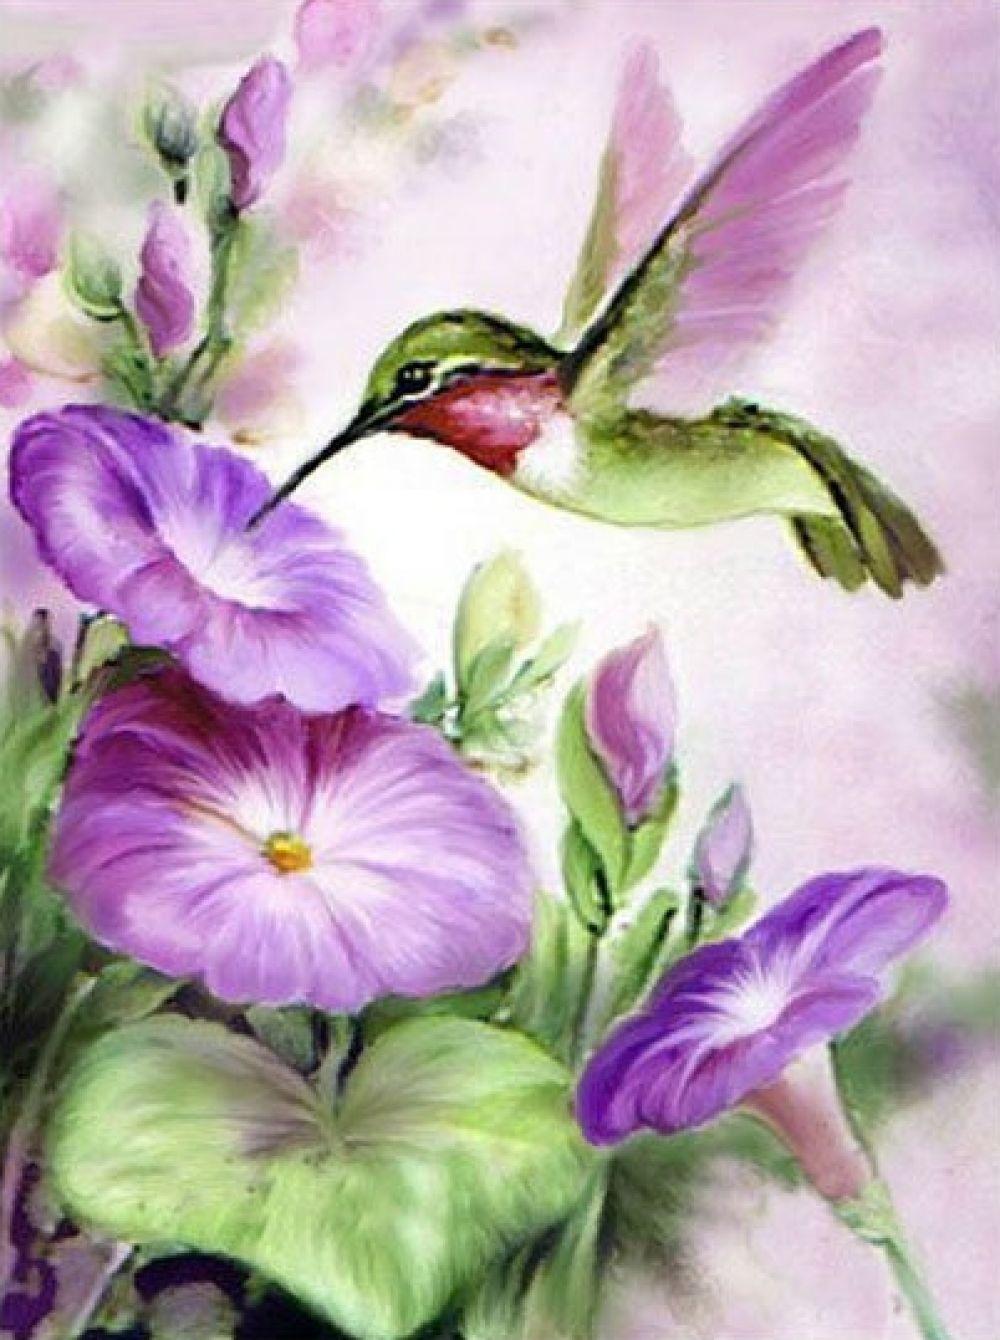 7aab8c0c8f Morning Glory Hummingbird Diamond Painting | $8.95 | FREE Shipping |  Secured Payment Gateway | #Bird #Flower #HomeDecor #Hummingbird  #Morningglory